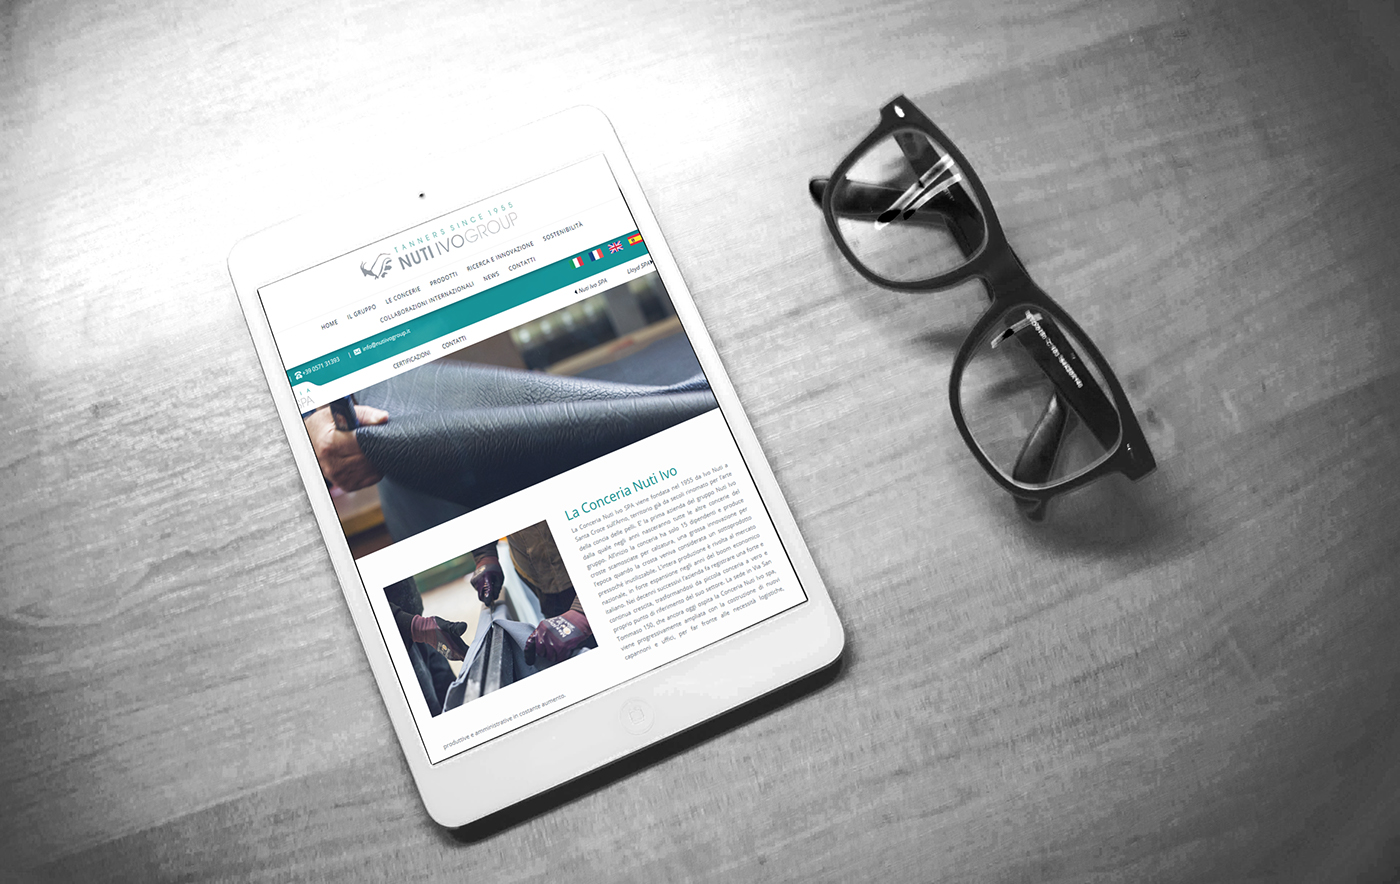 Sito web vetrina responsiva Gruppo Nuti Ivo, tablet